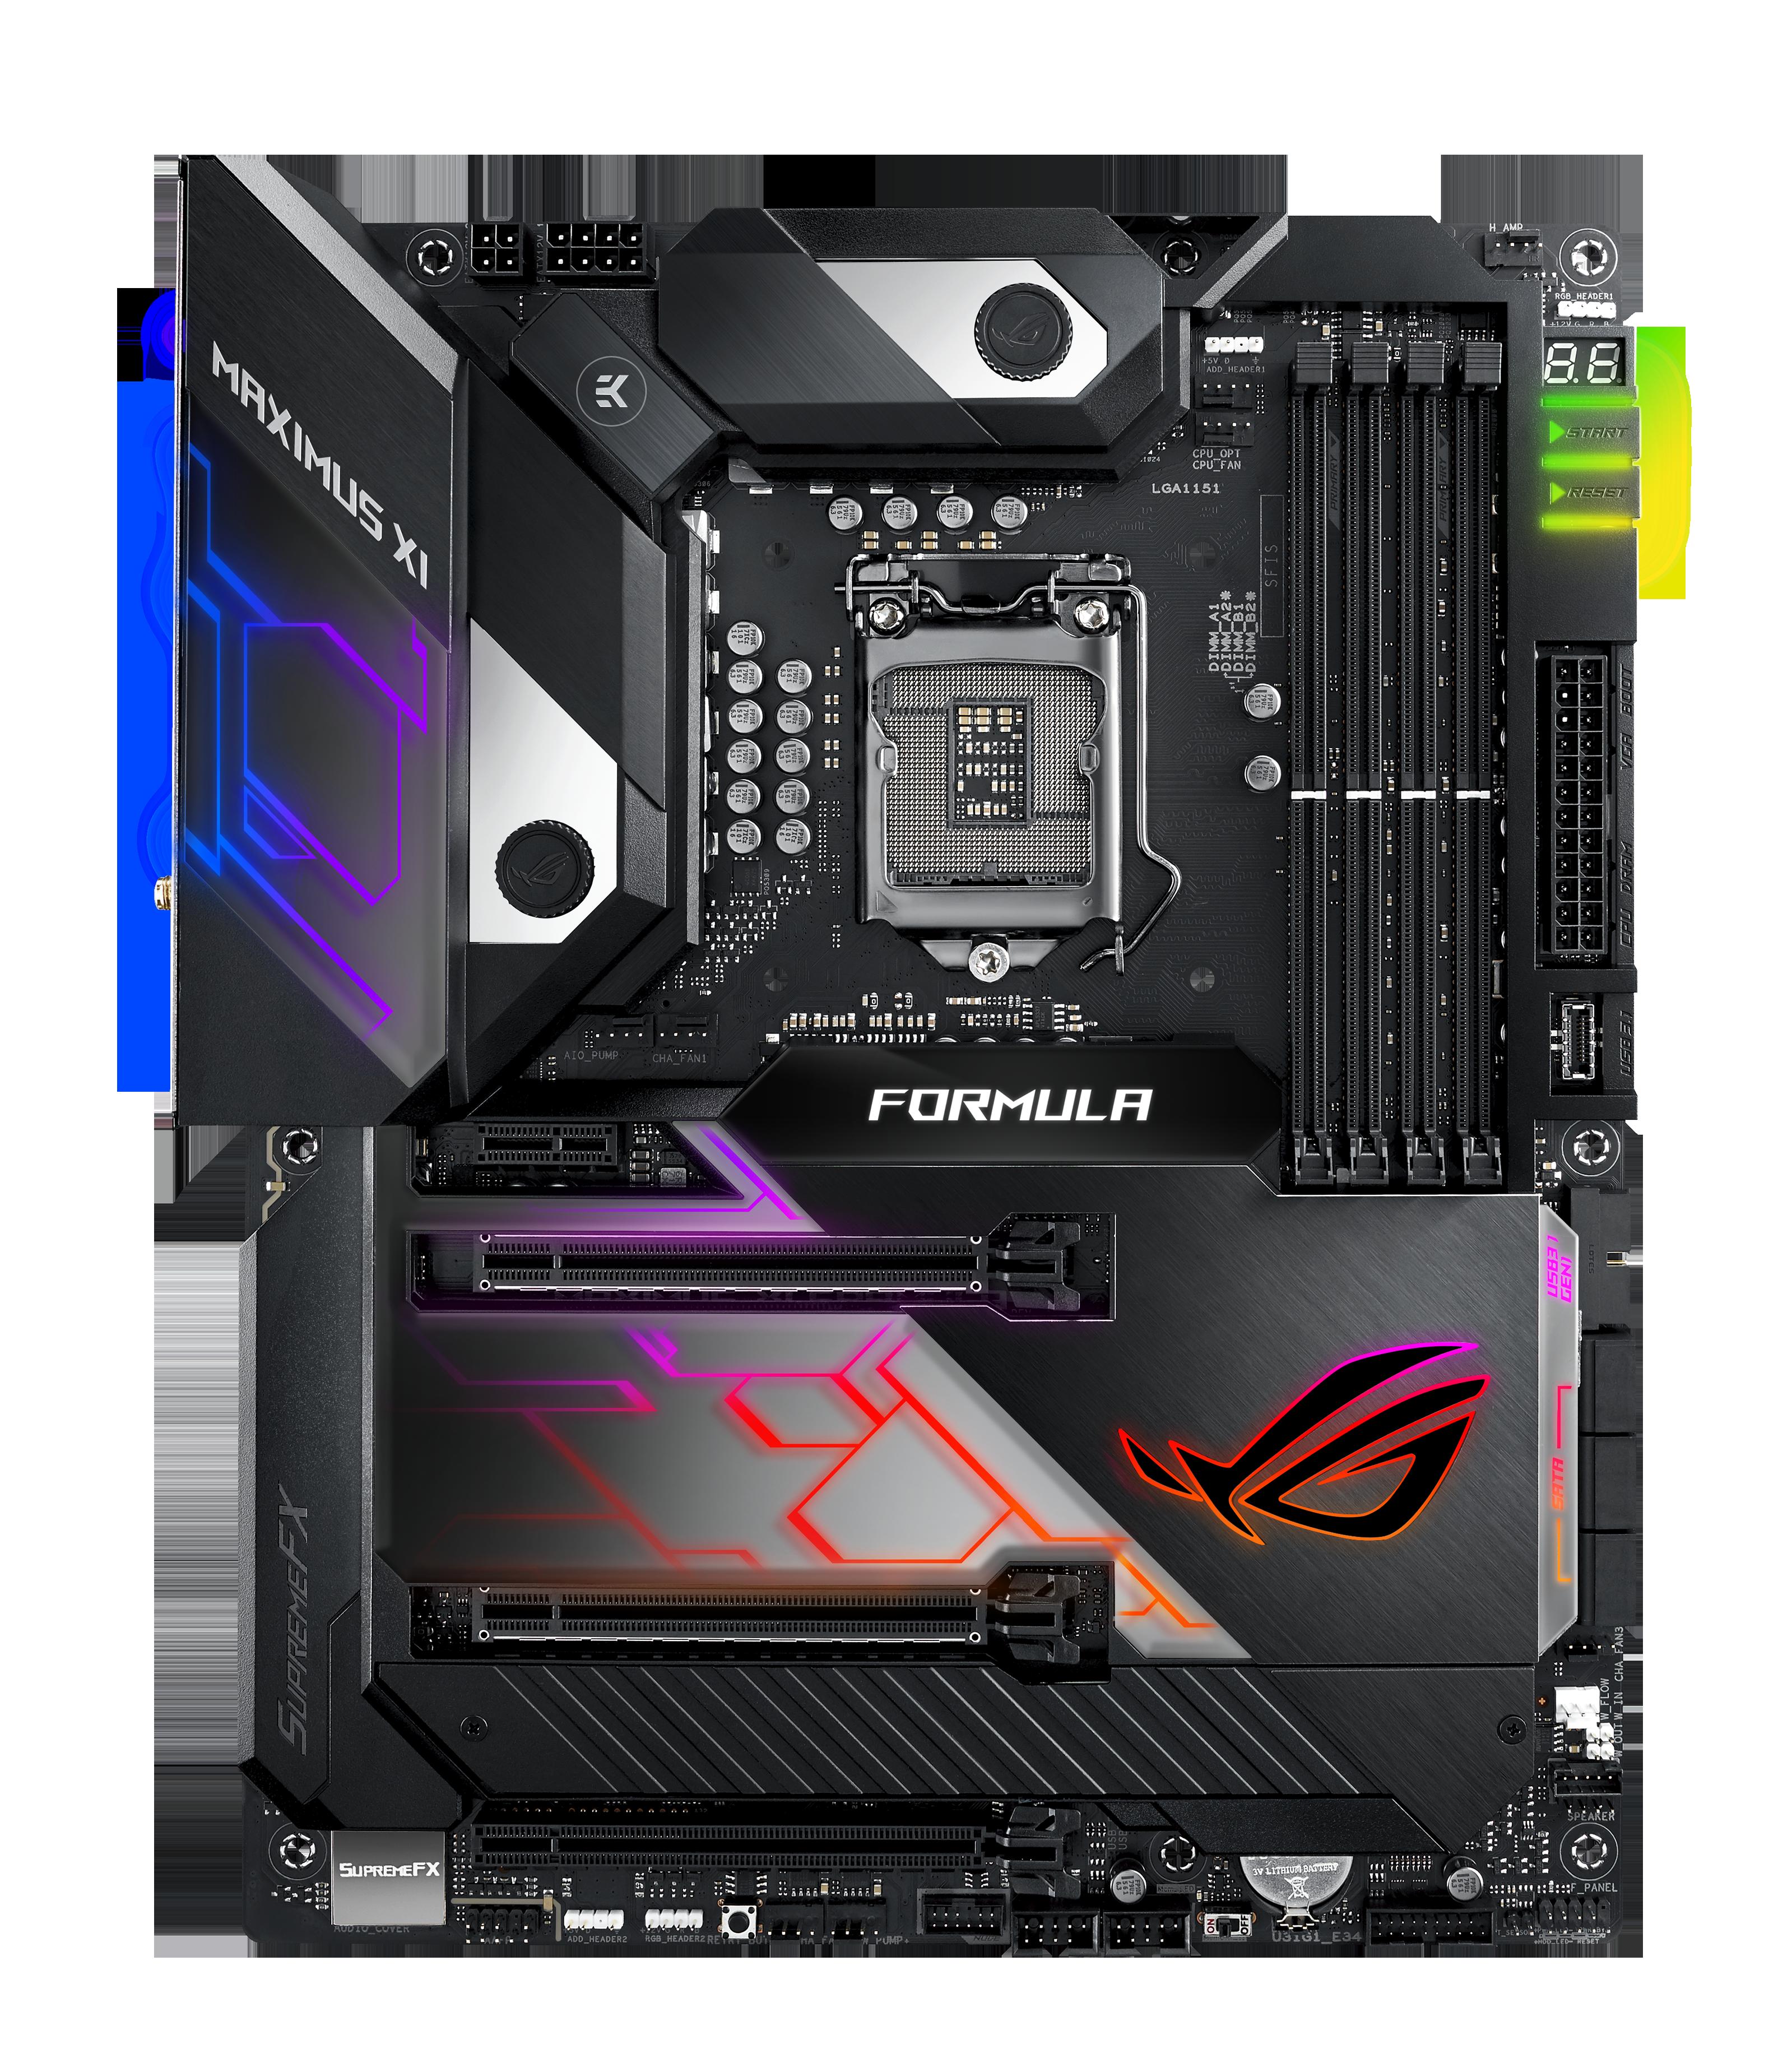 Asus Unleash A Plethora Of Intel Z390 Motherboards Motherboard